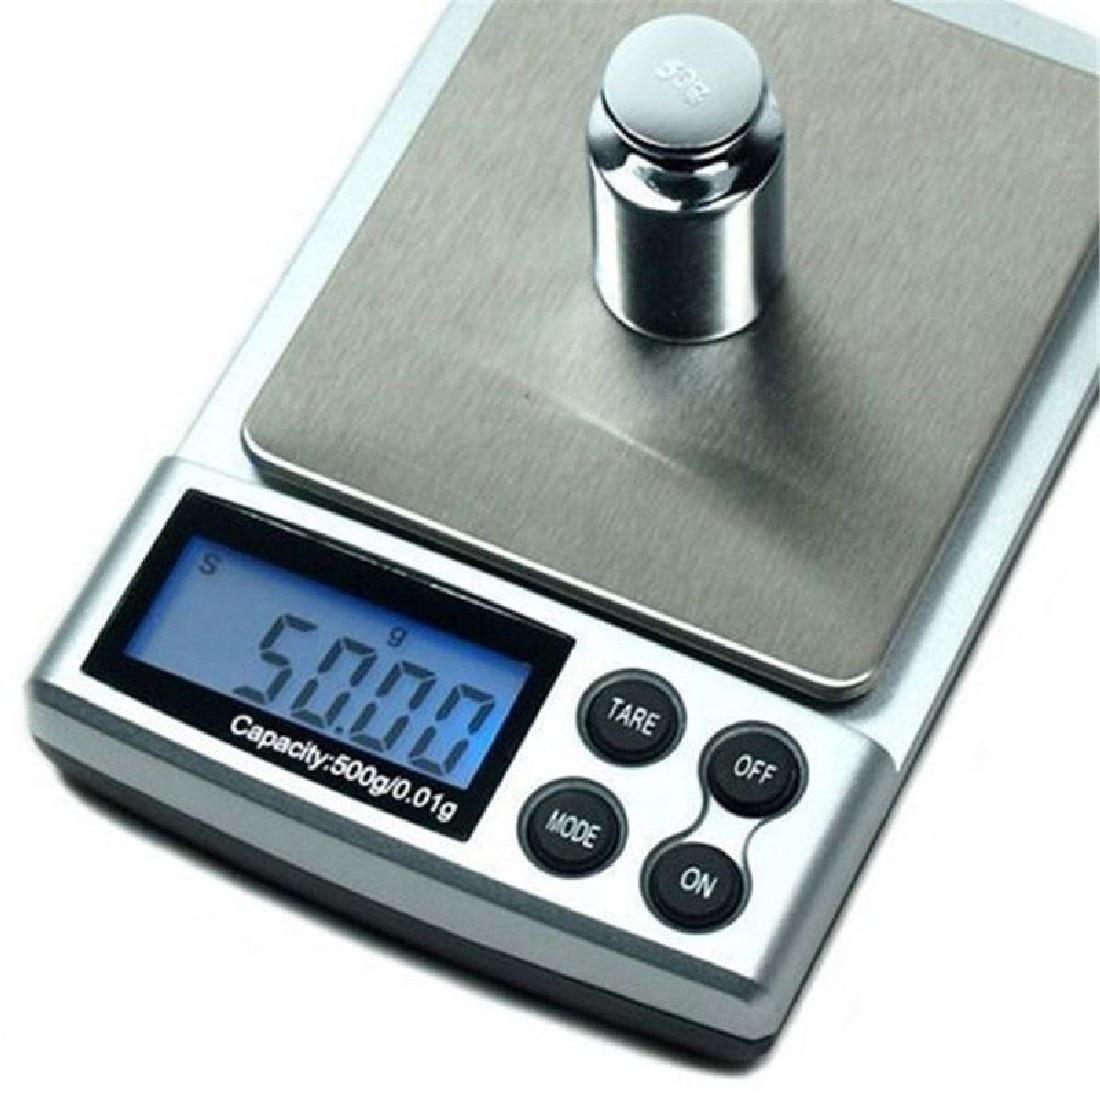 1pc 500g x 0.01g Escala de precisión digital Oro Plata Joyería - Instrumentos de medición - foto 4